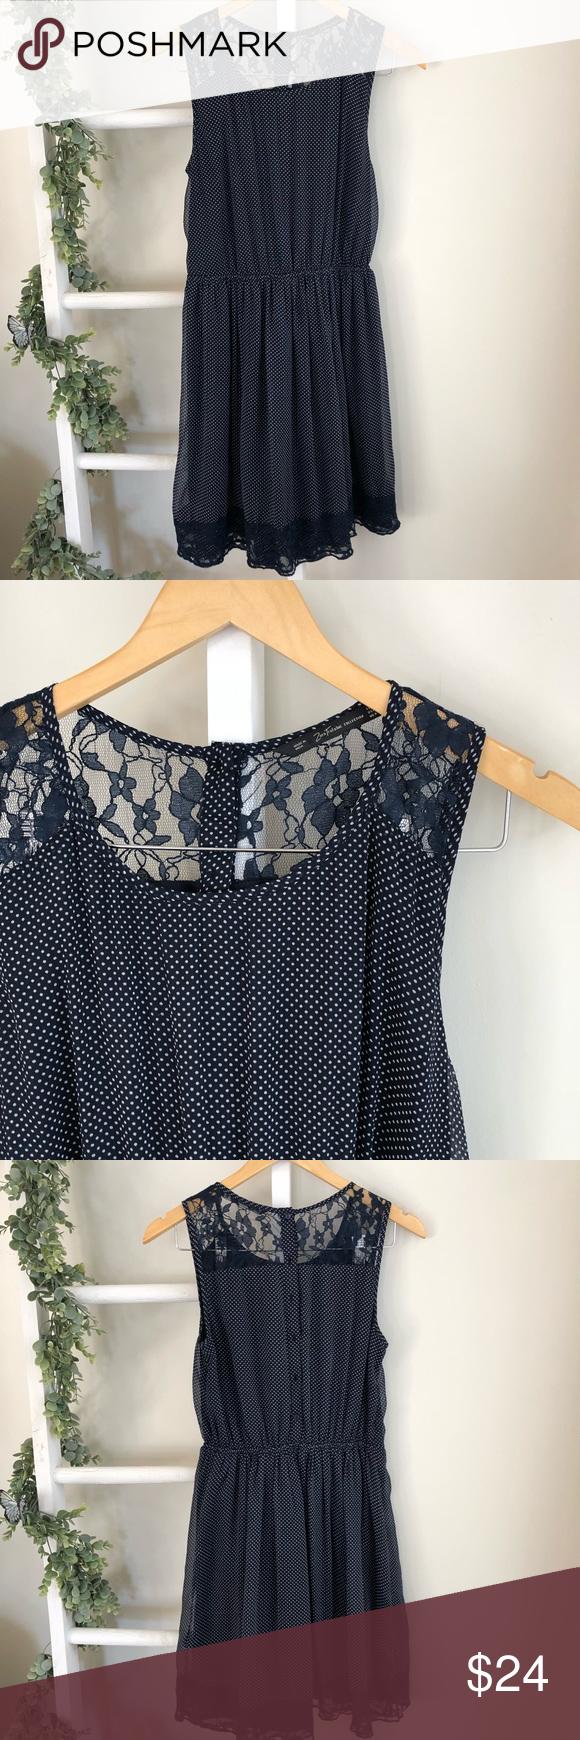 "381883705096fb Zara polka dot lace dress EUC Elastic waist, button down back, lace  detailing Measures Pit to pit 16.5"" Shoulder to hem 35"" 0610 Zara Dresses"